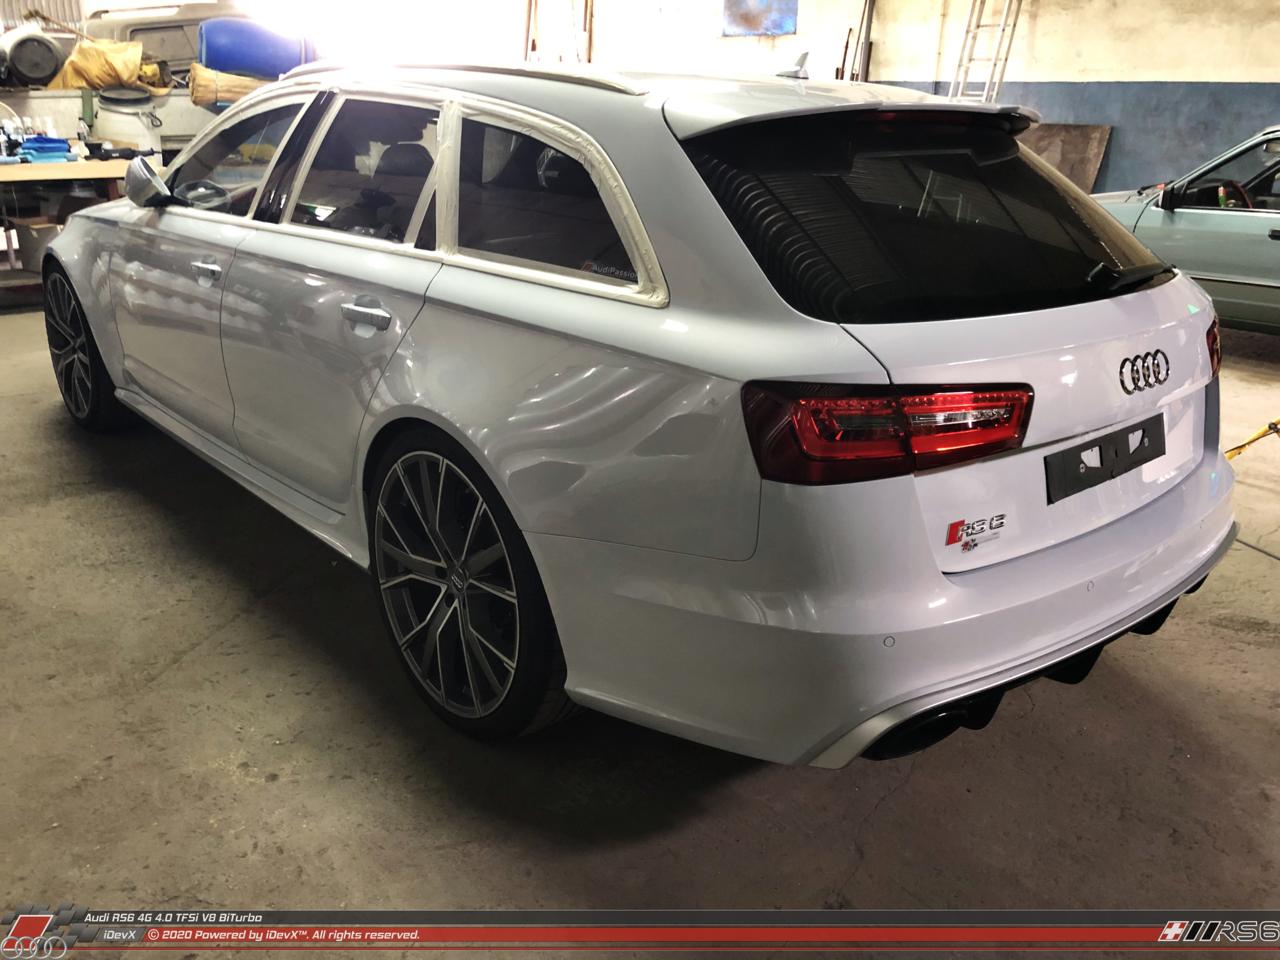 05_08.2019_Audi-RS6_iDevX_022.png